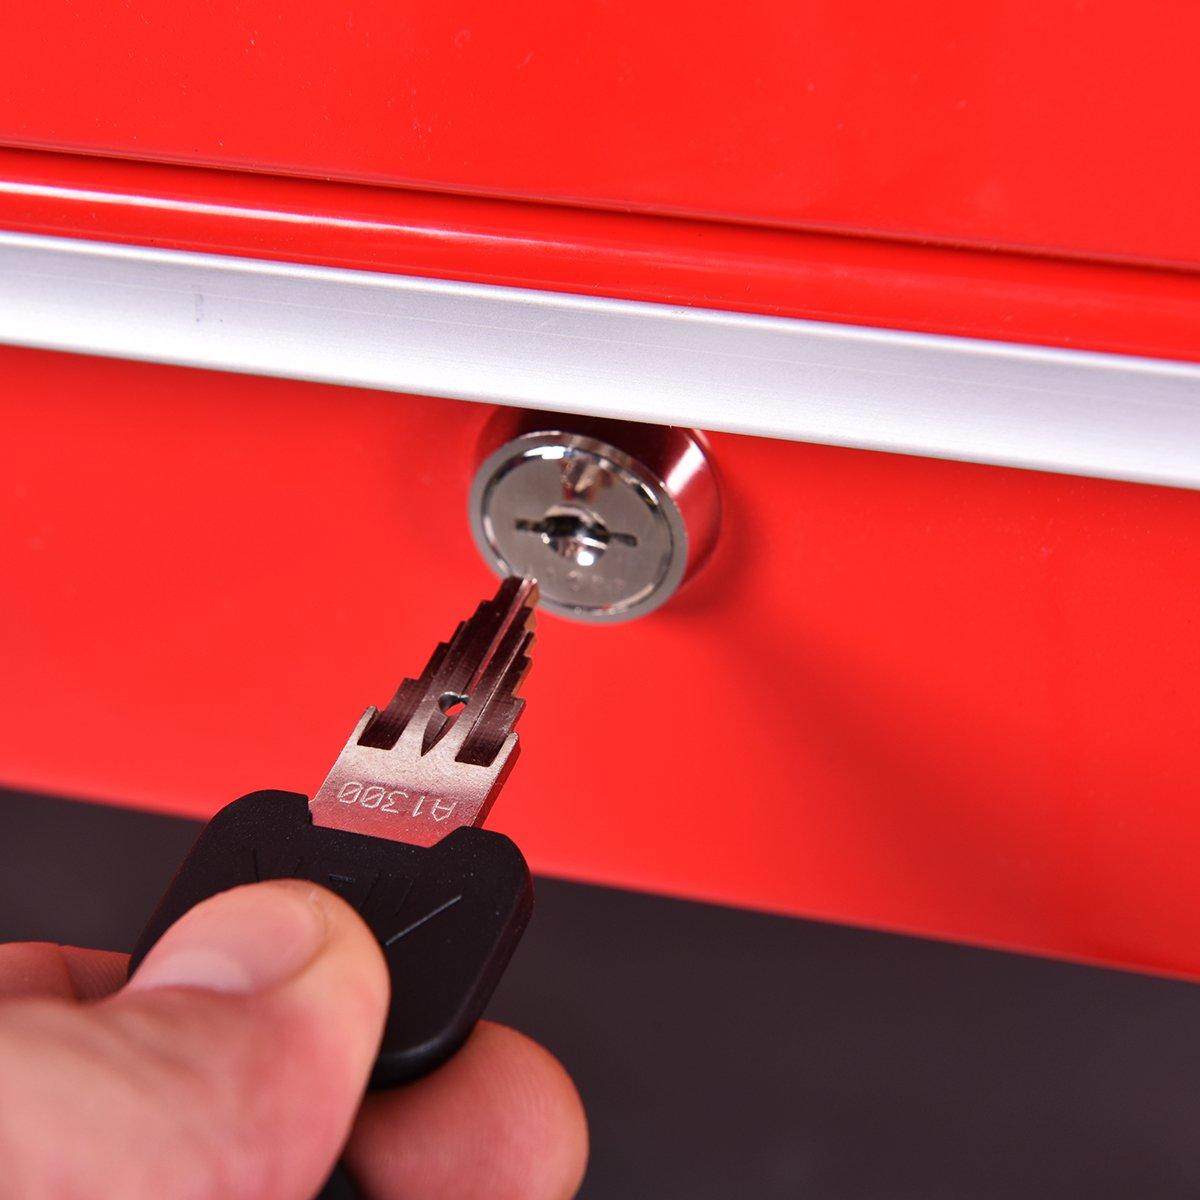 Goplus Tool Cart Rolling 36-Inch Steel Tool Chest Box Wheels Trays w/ Locking Drawer, Red by Goplus (Image #3)